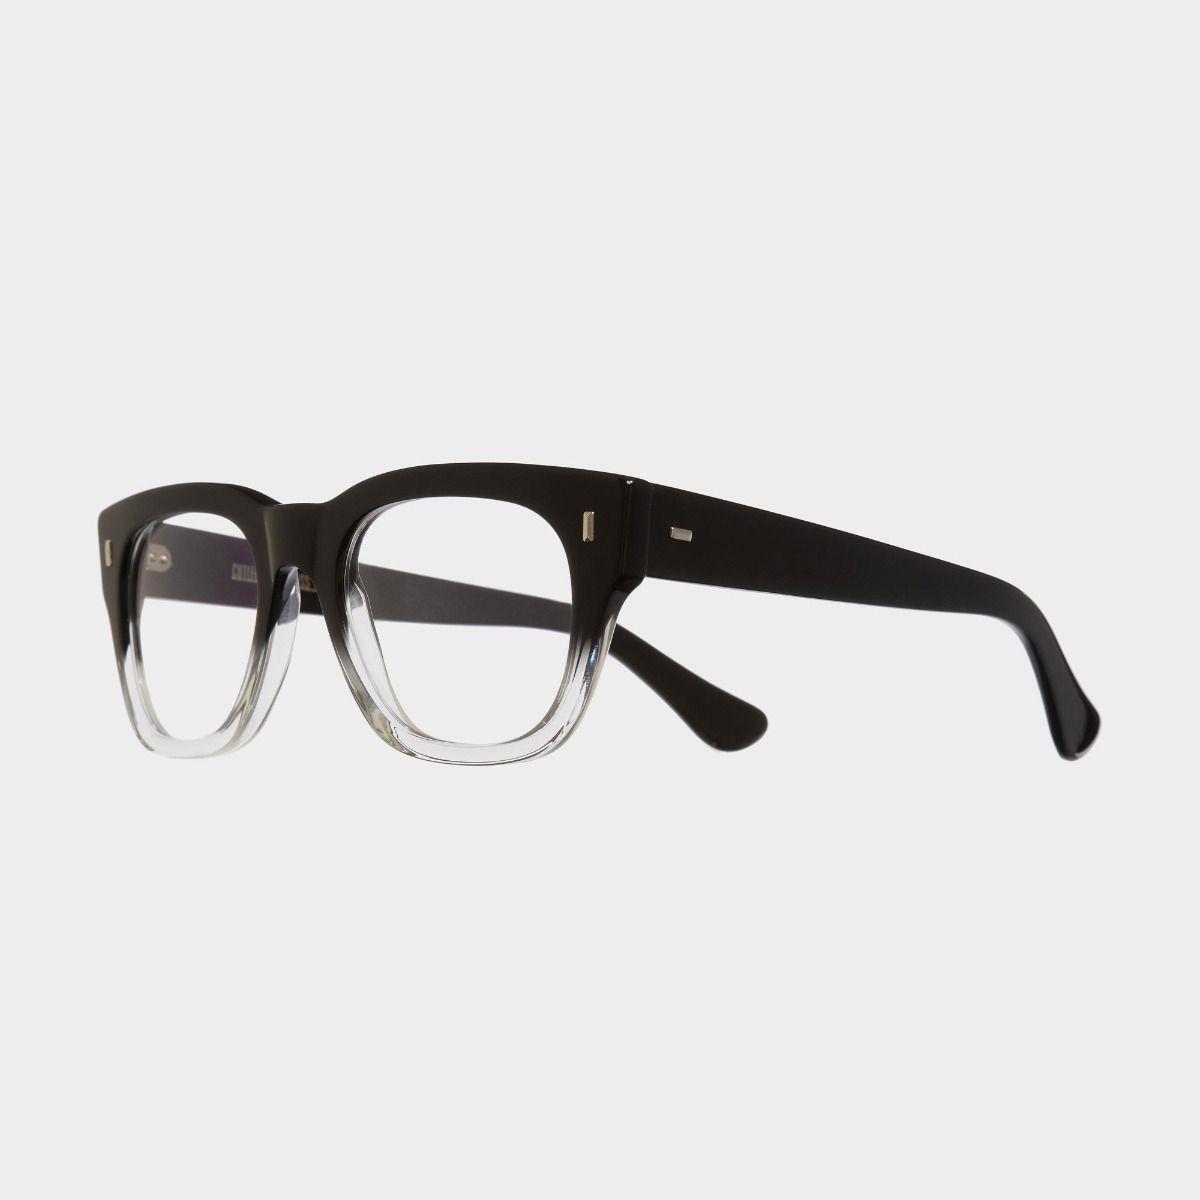 cutler and gross modello 0772v2 nero trasparente